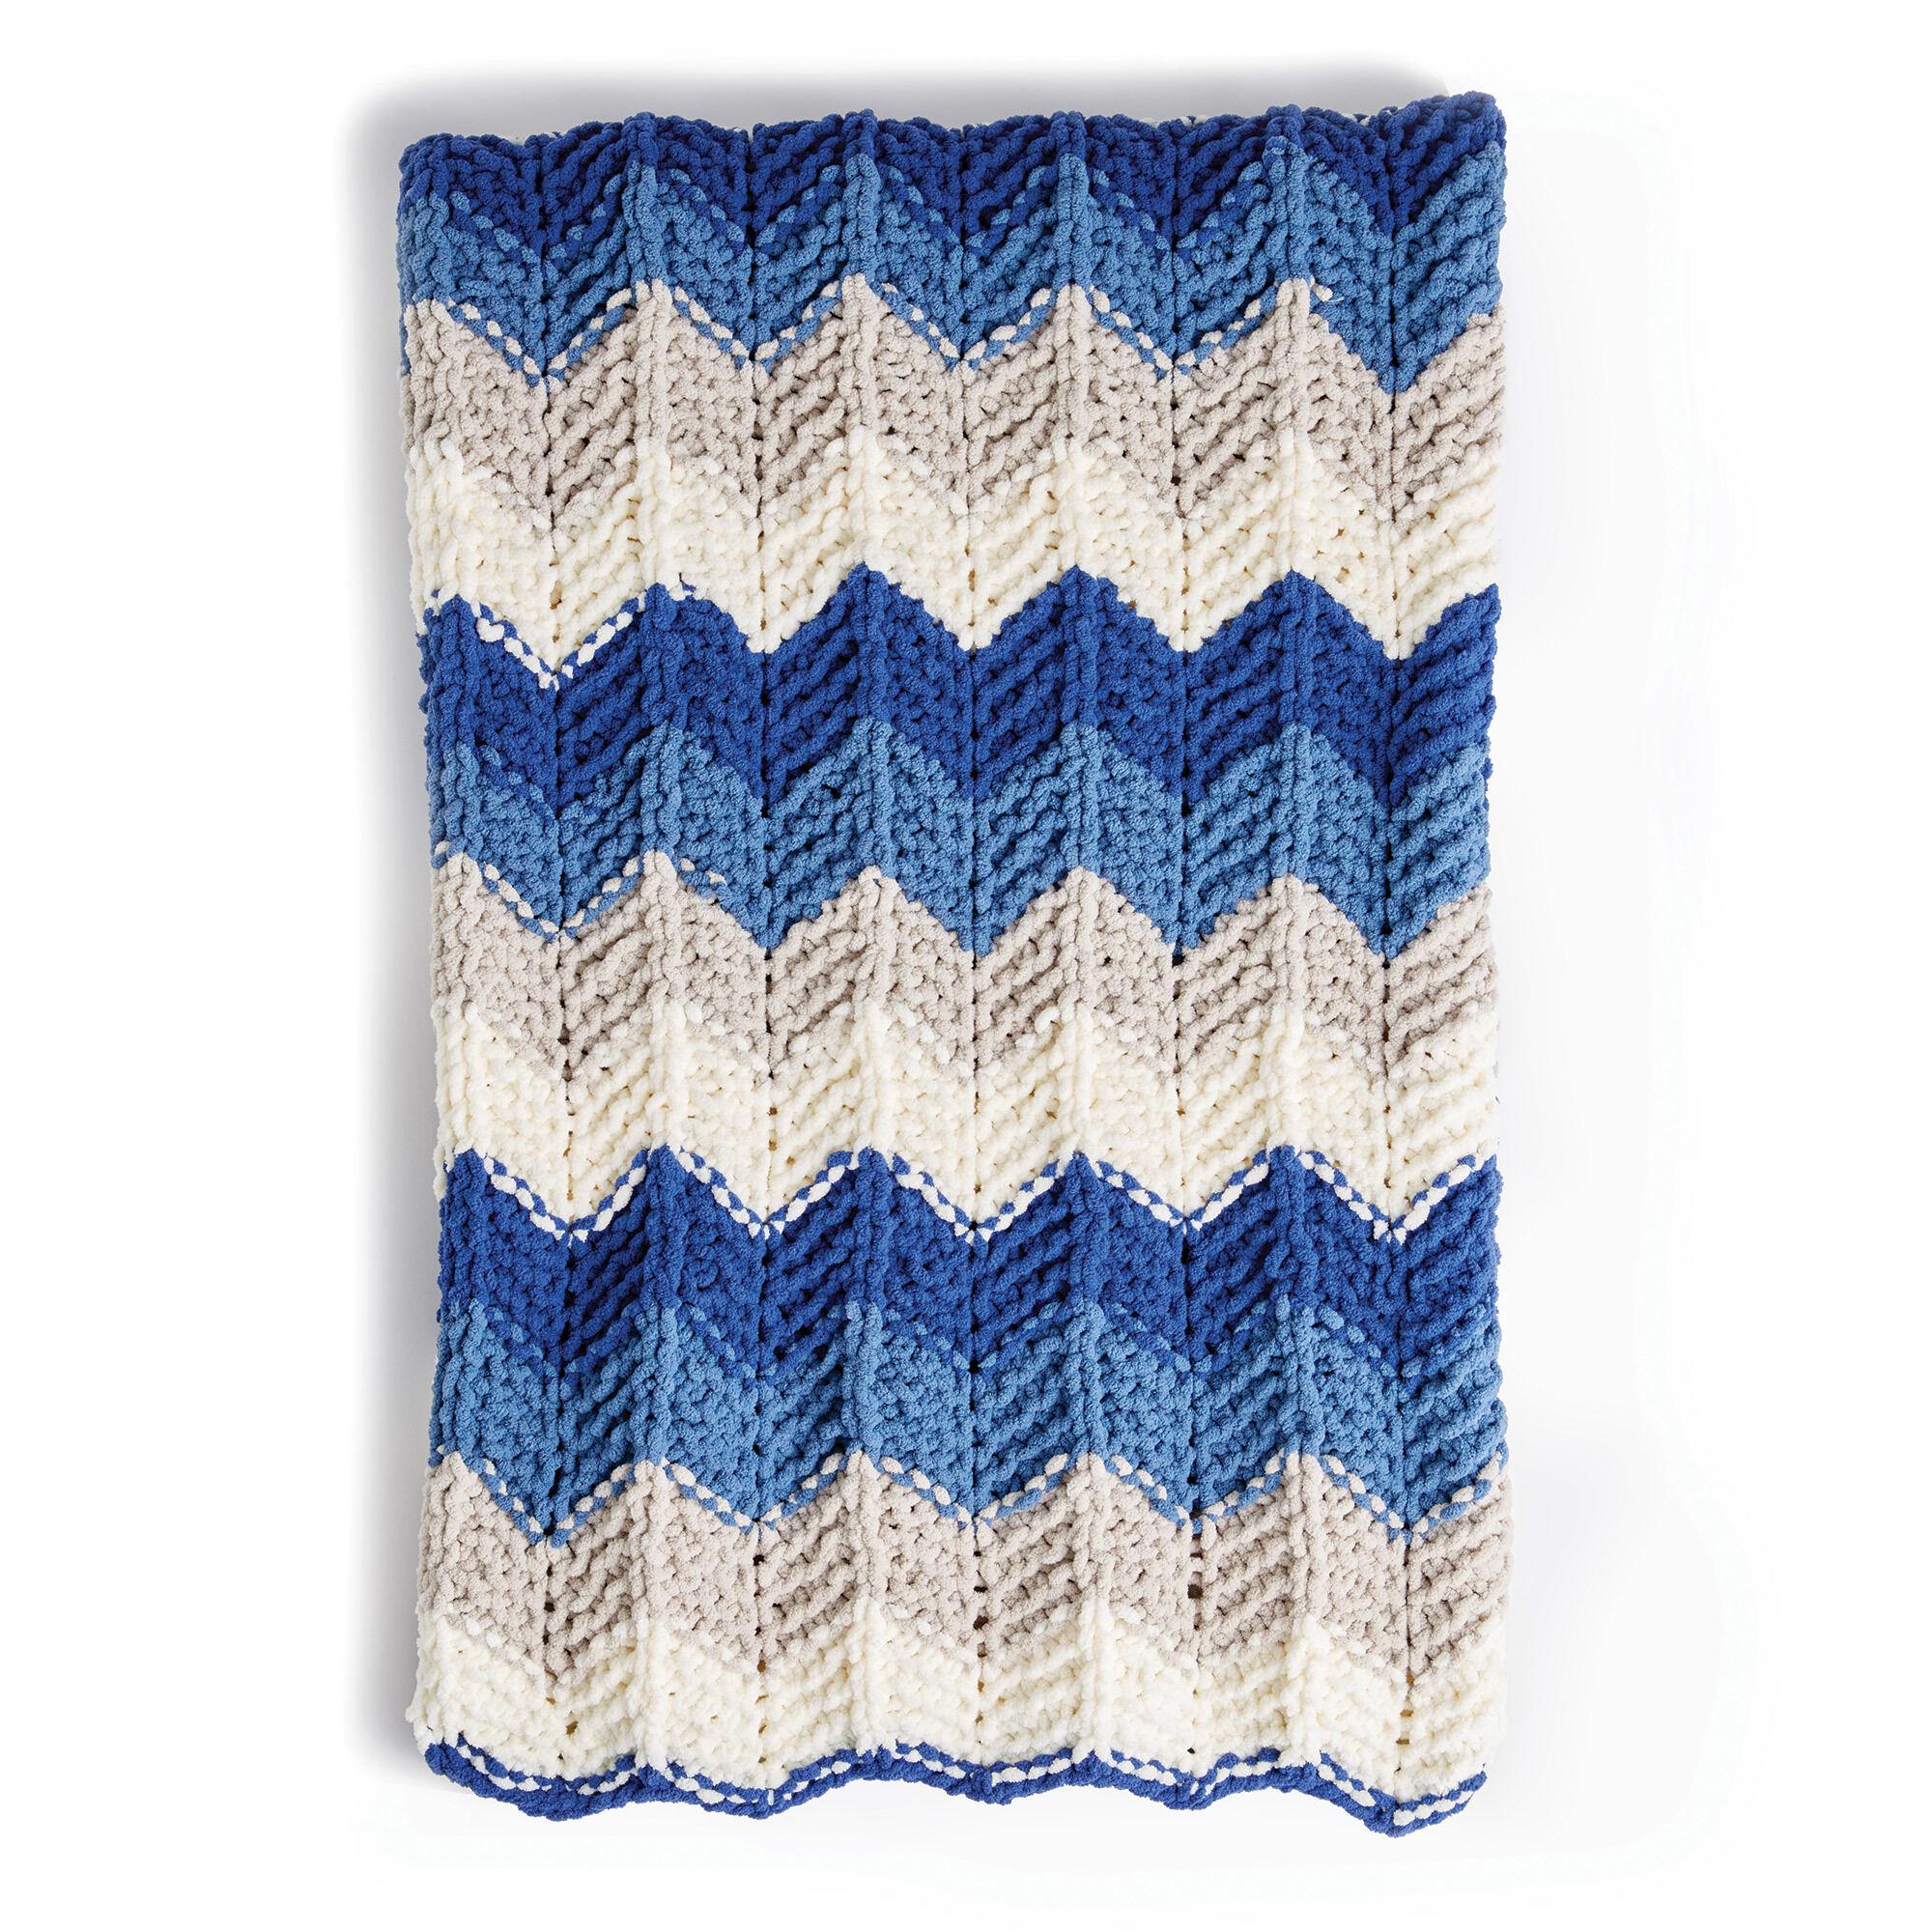 Bernat Radiant Ripple Knit Blanket Pattern | Yarnspirations ...